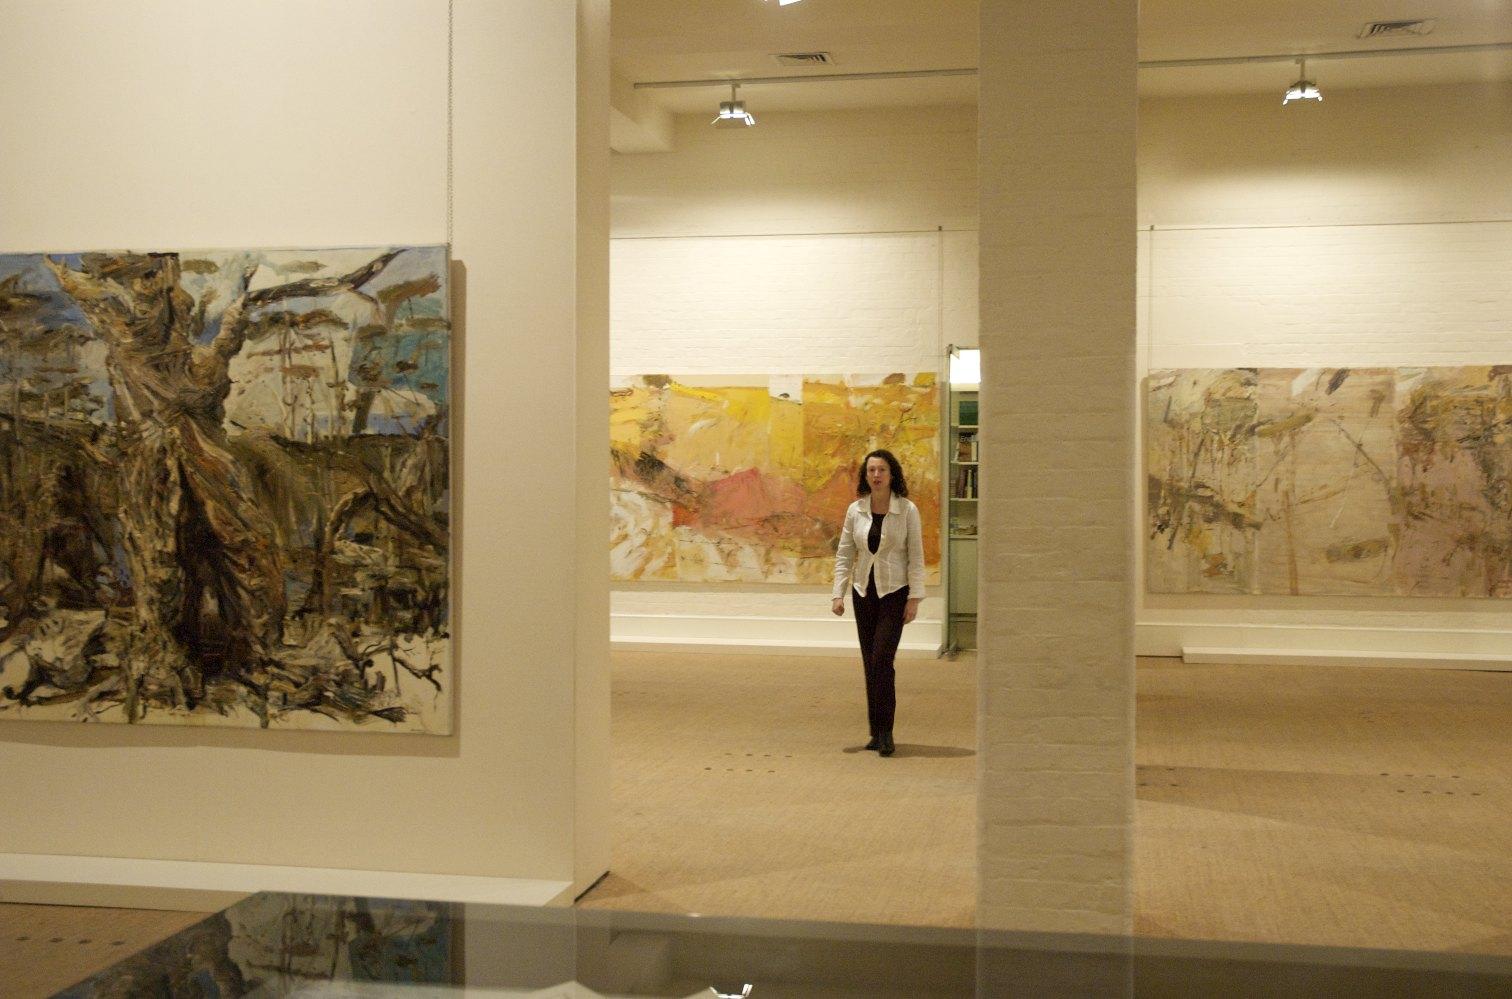 John R Walker » 2008 Journey through Landscape S H Ervin Gallery Gallery R on